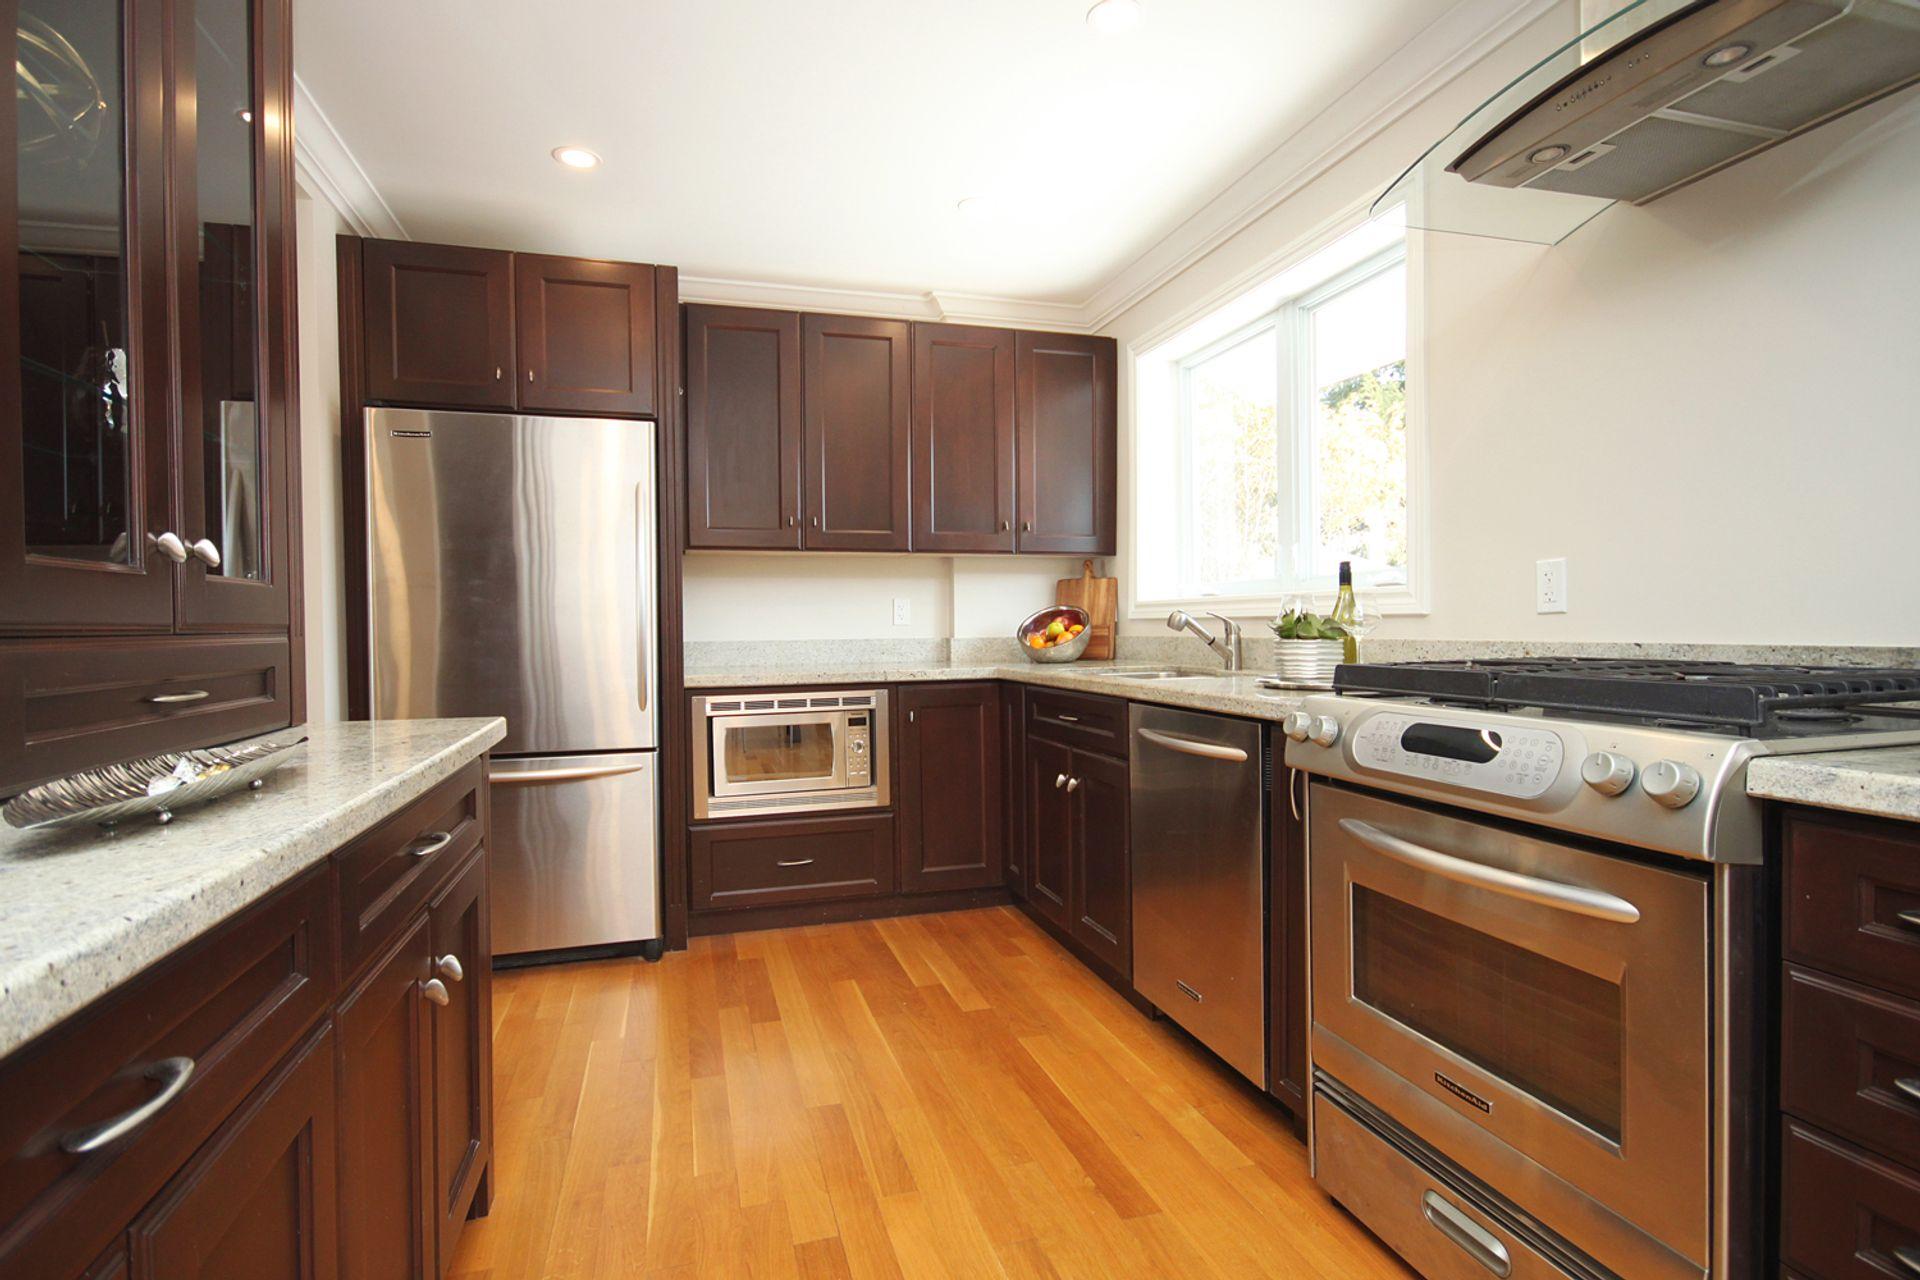 Kitchen at 21 Kestell Lane, Parkwoods-Donalda, Toronto